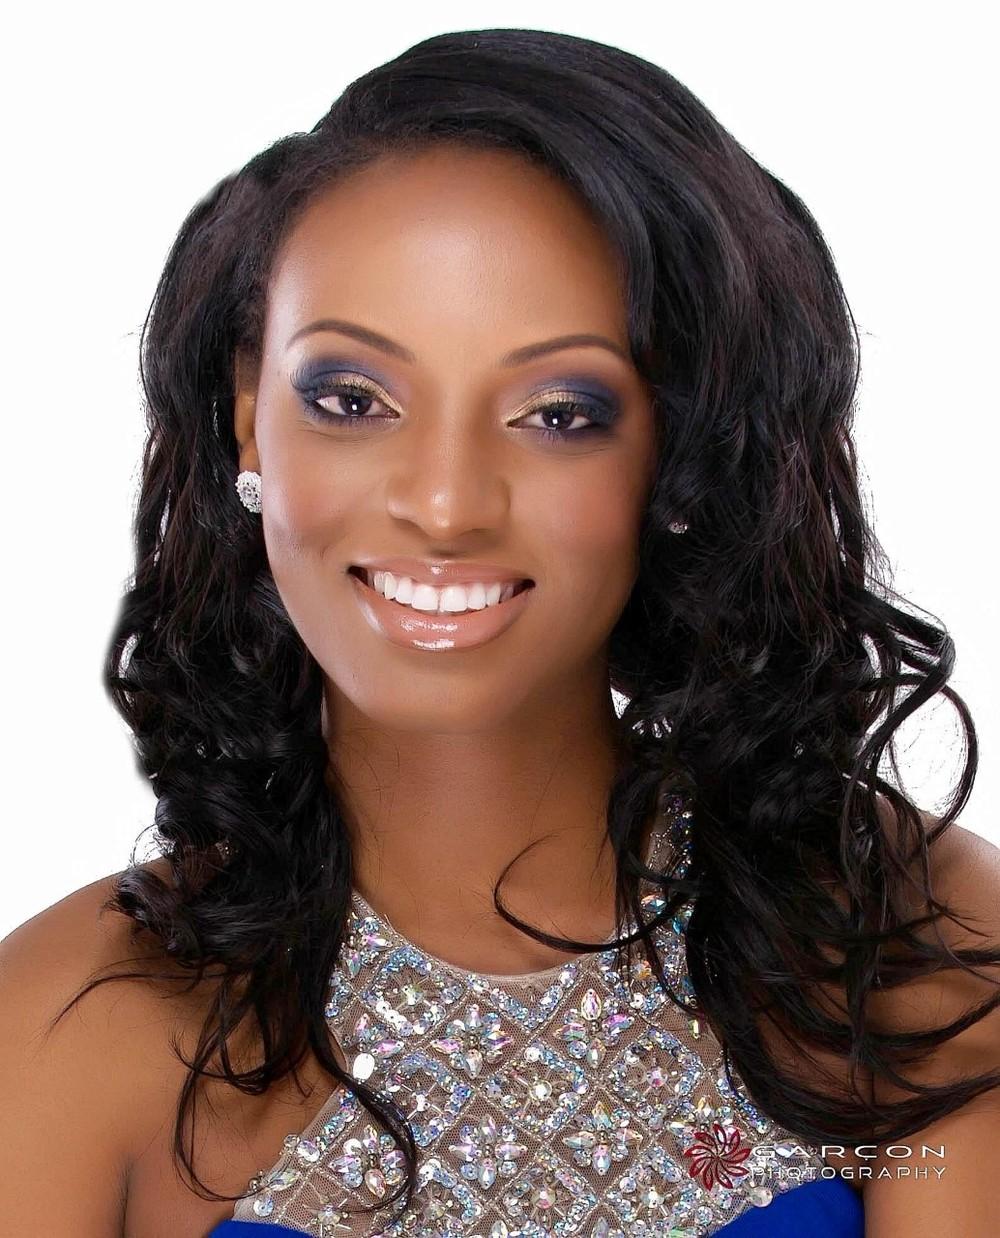 Nupsie-Flore Exantus, Miss Haiti International 2016 - Photo: Garçon Photography